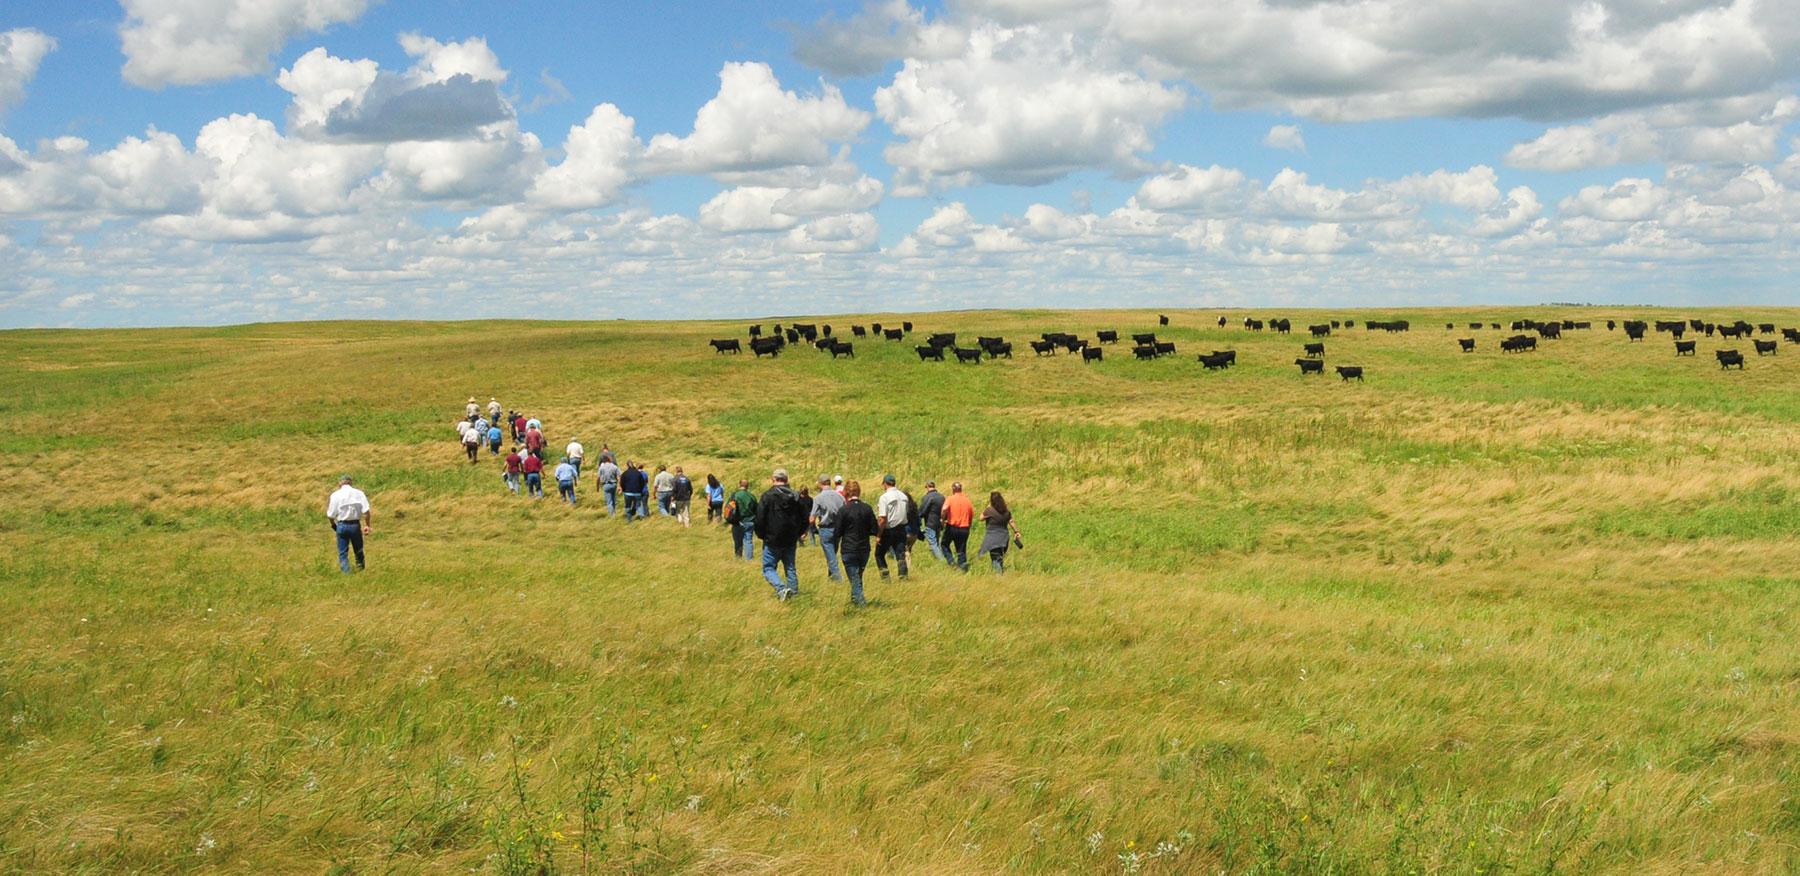 Group of People in a Prairie